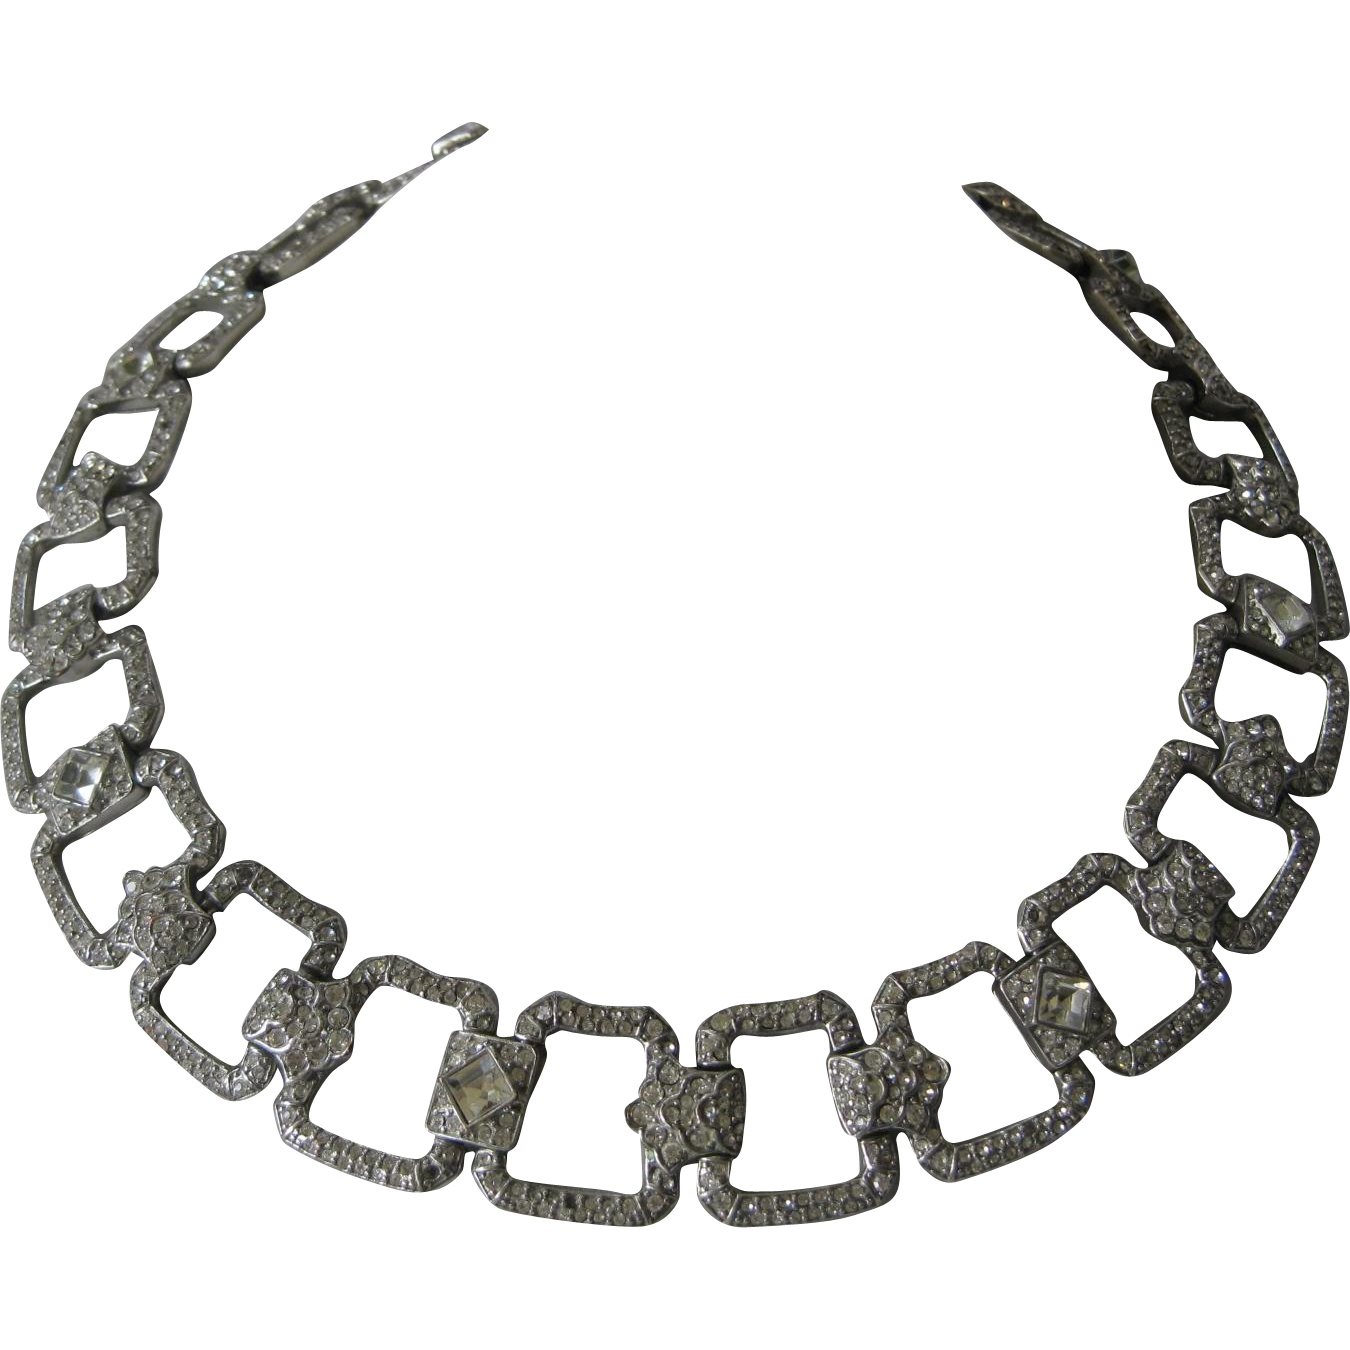 Stunning Intricate Rhinestones Covered Vintage Necklace CAROLEE